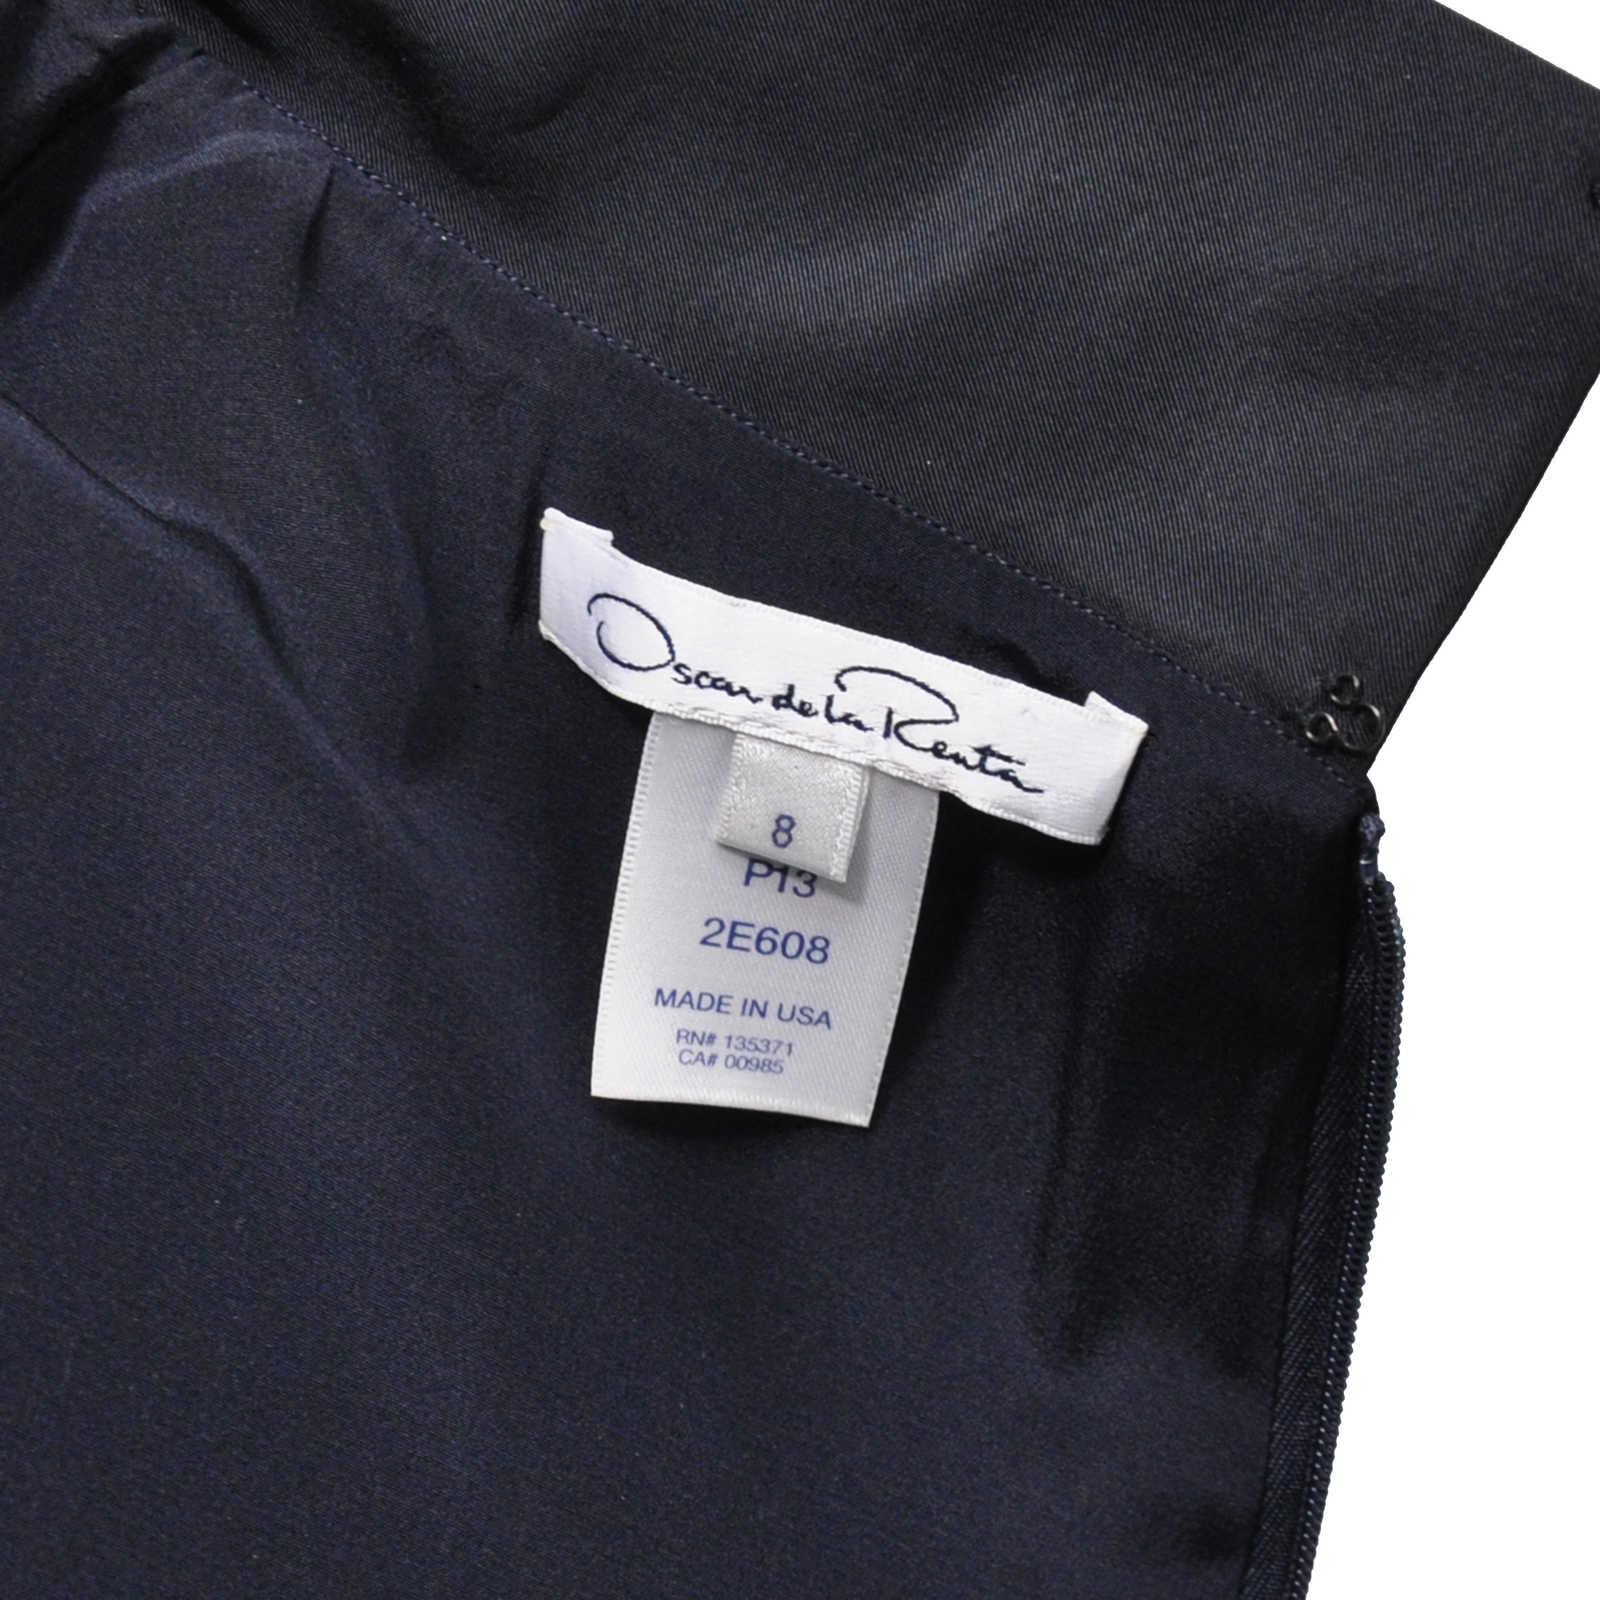 0eff24c540ec2 ... Authentic Second Hand Oscar de la Renta Silk Embellished Dress  (PSS-200-00491